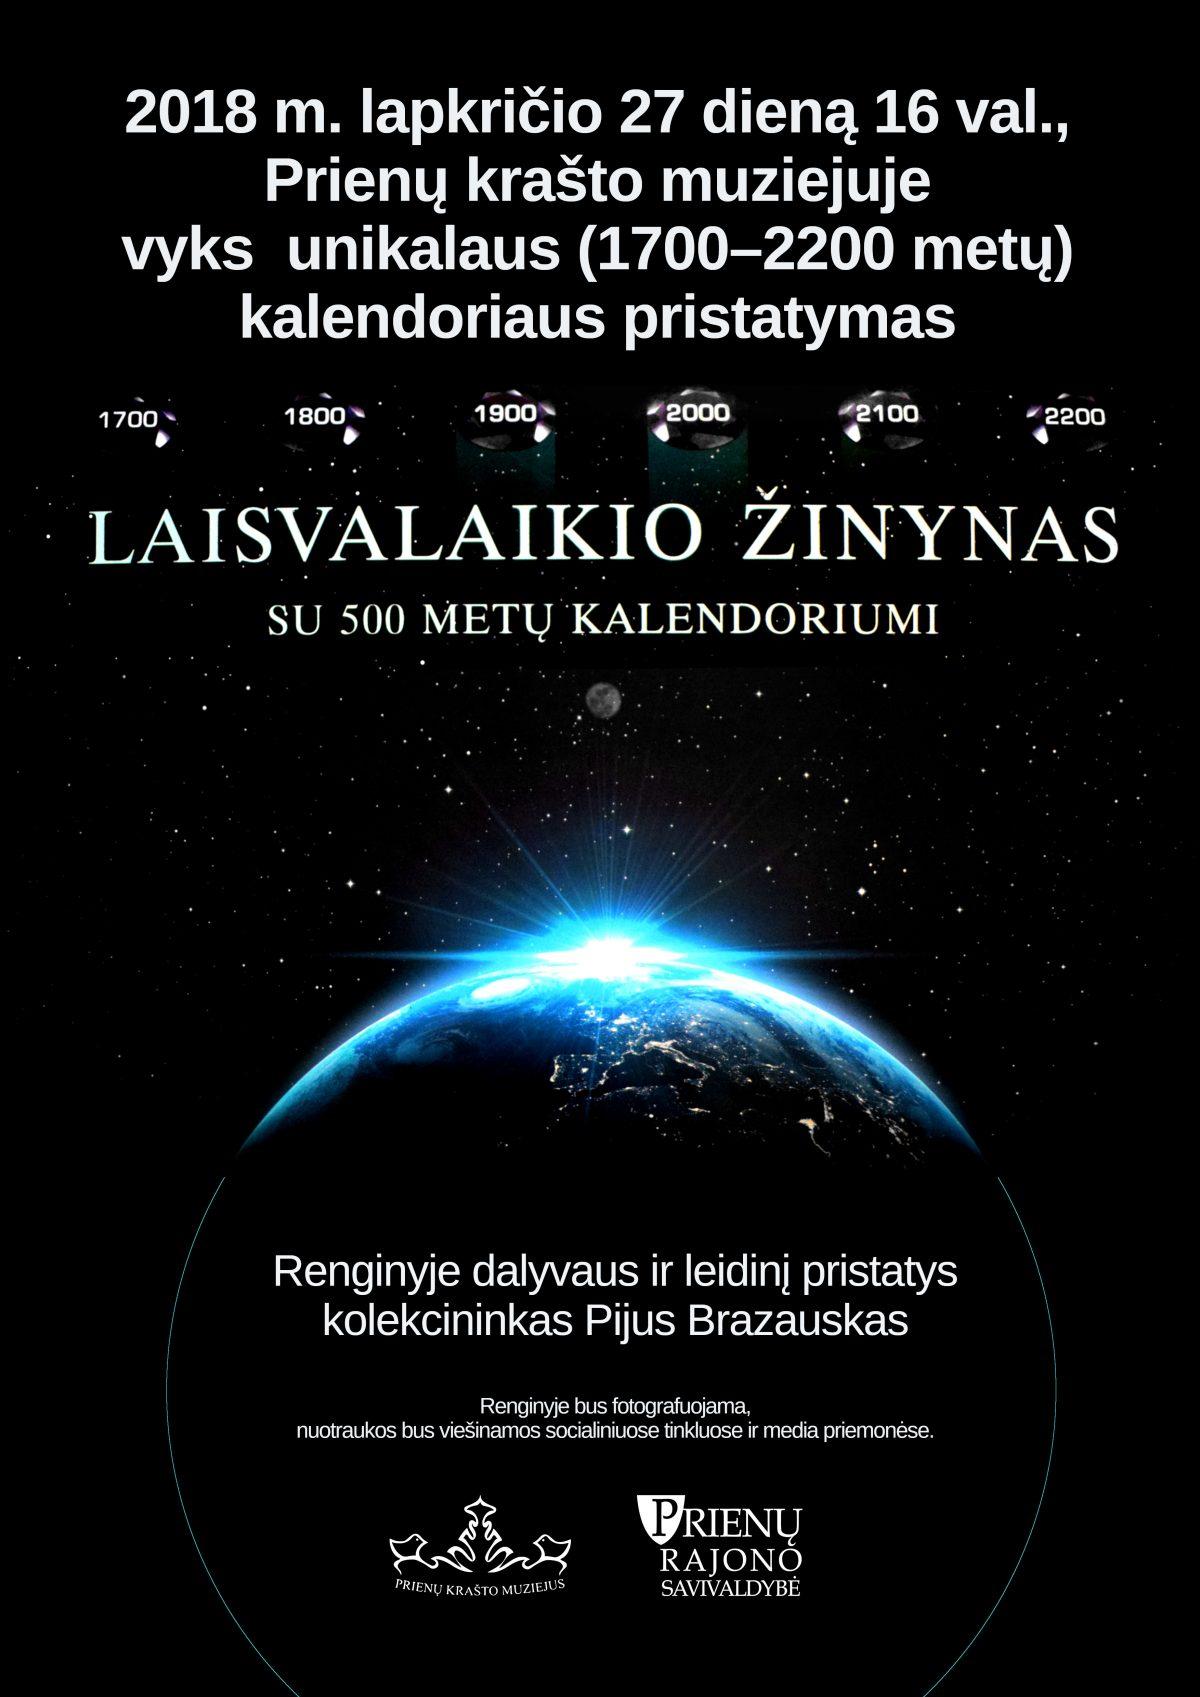 web_500MetuKalendoriusu_Plakatas